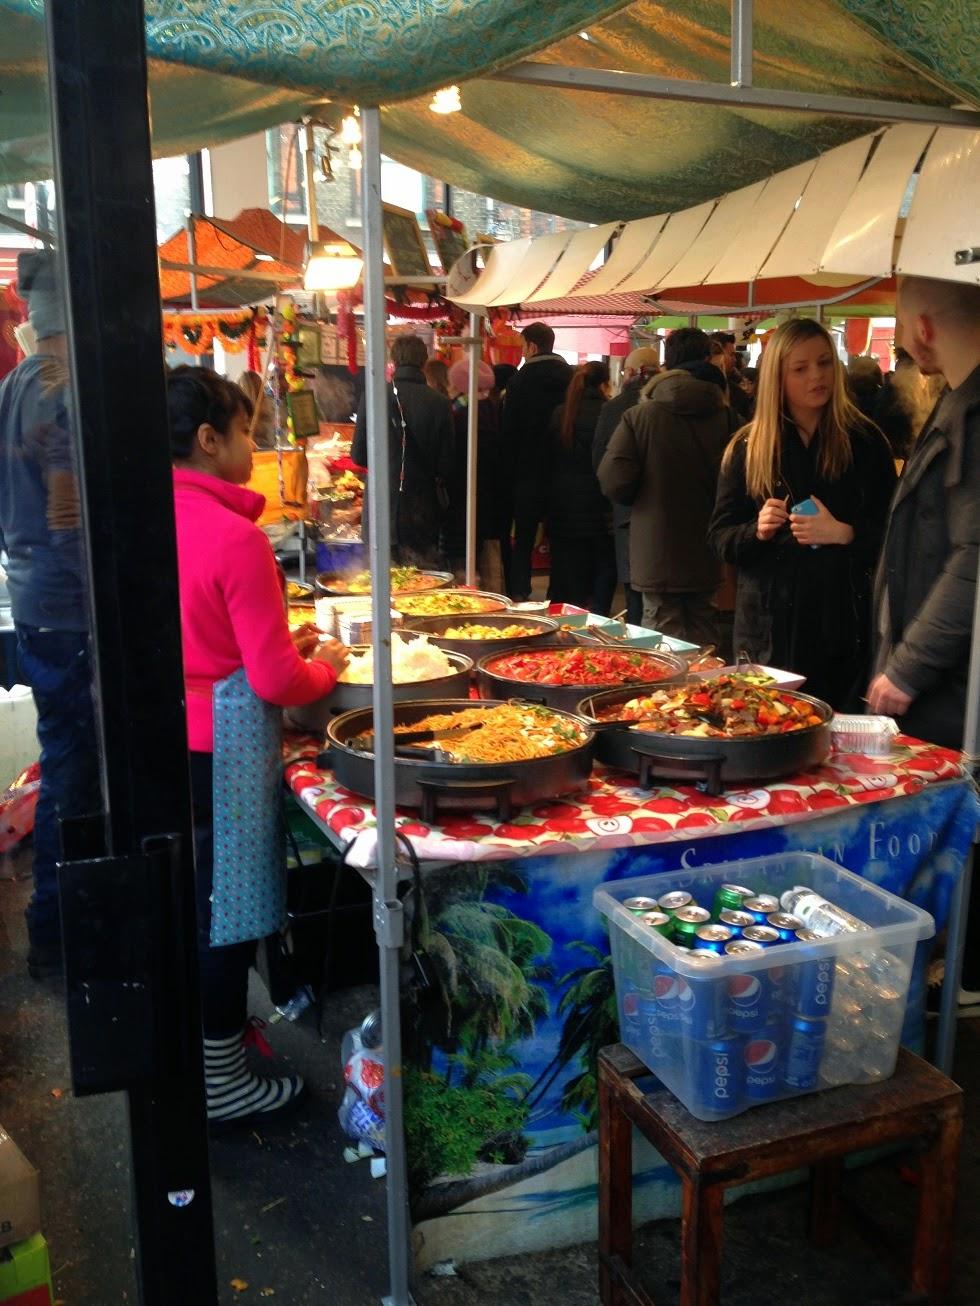 Shoreditch Market: Final Part Of My Recent Urban Wander In And Around